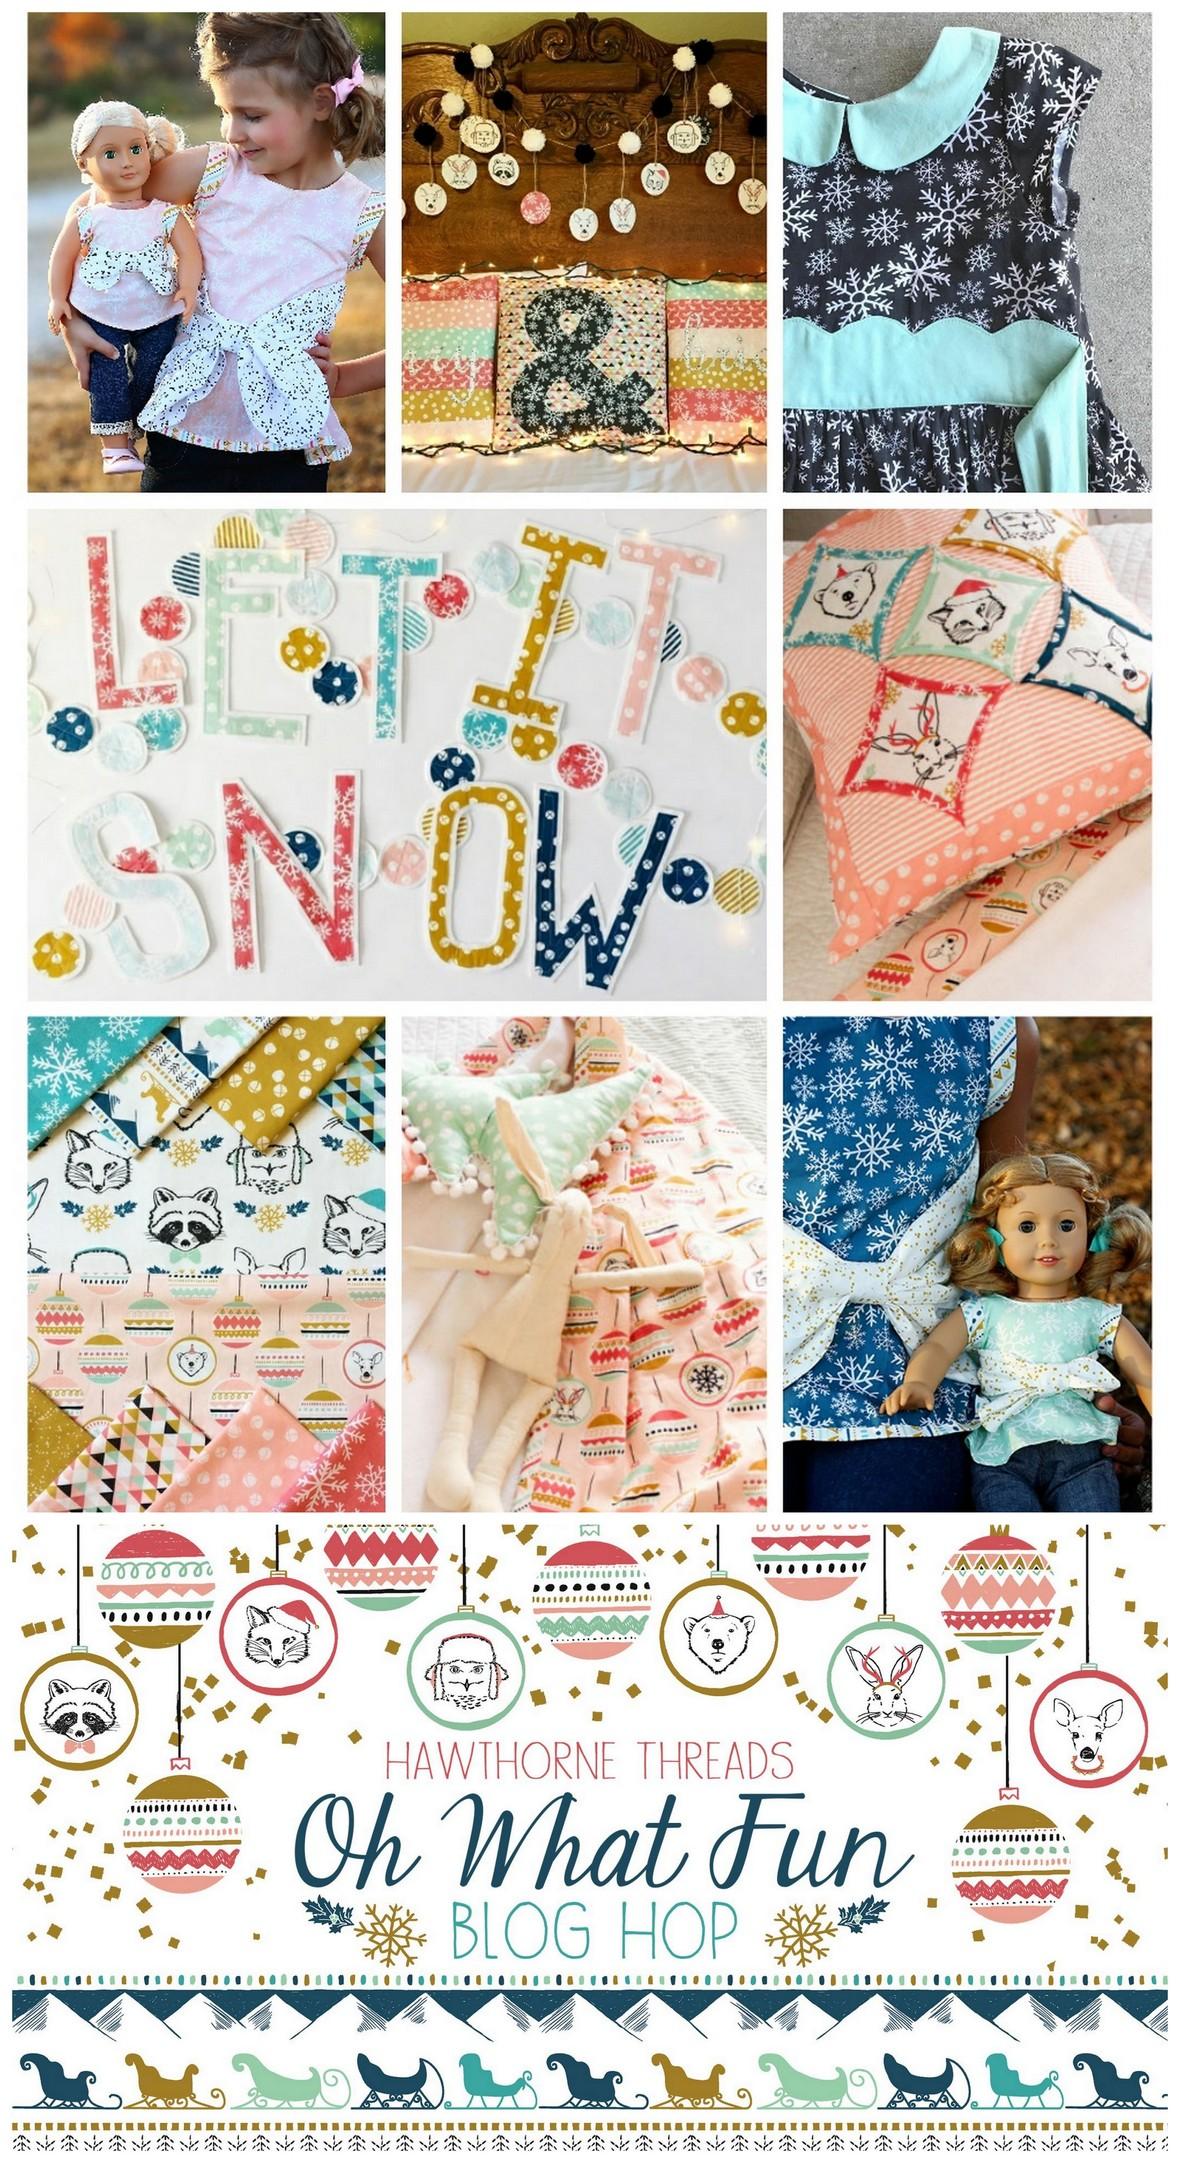 Hawthorne Threads Oh What Fun Fabric Blog Hop